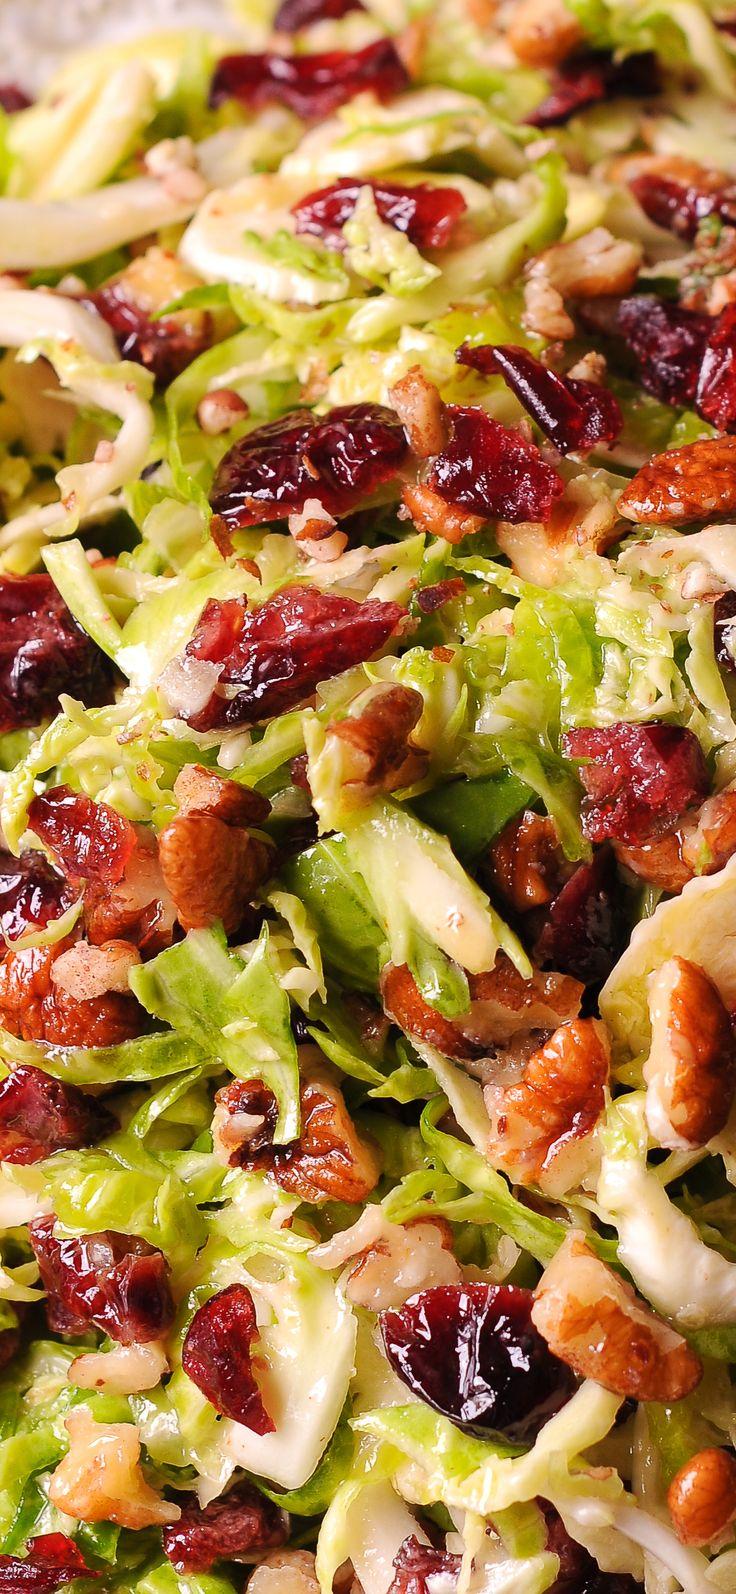 Rosenkohlsalat mit Honig-Senf-Vinaigrette   – Salads